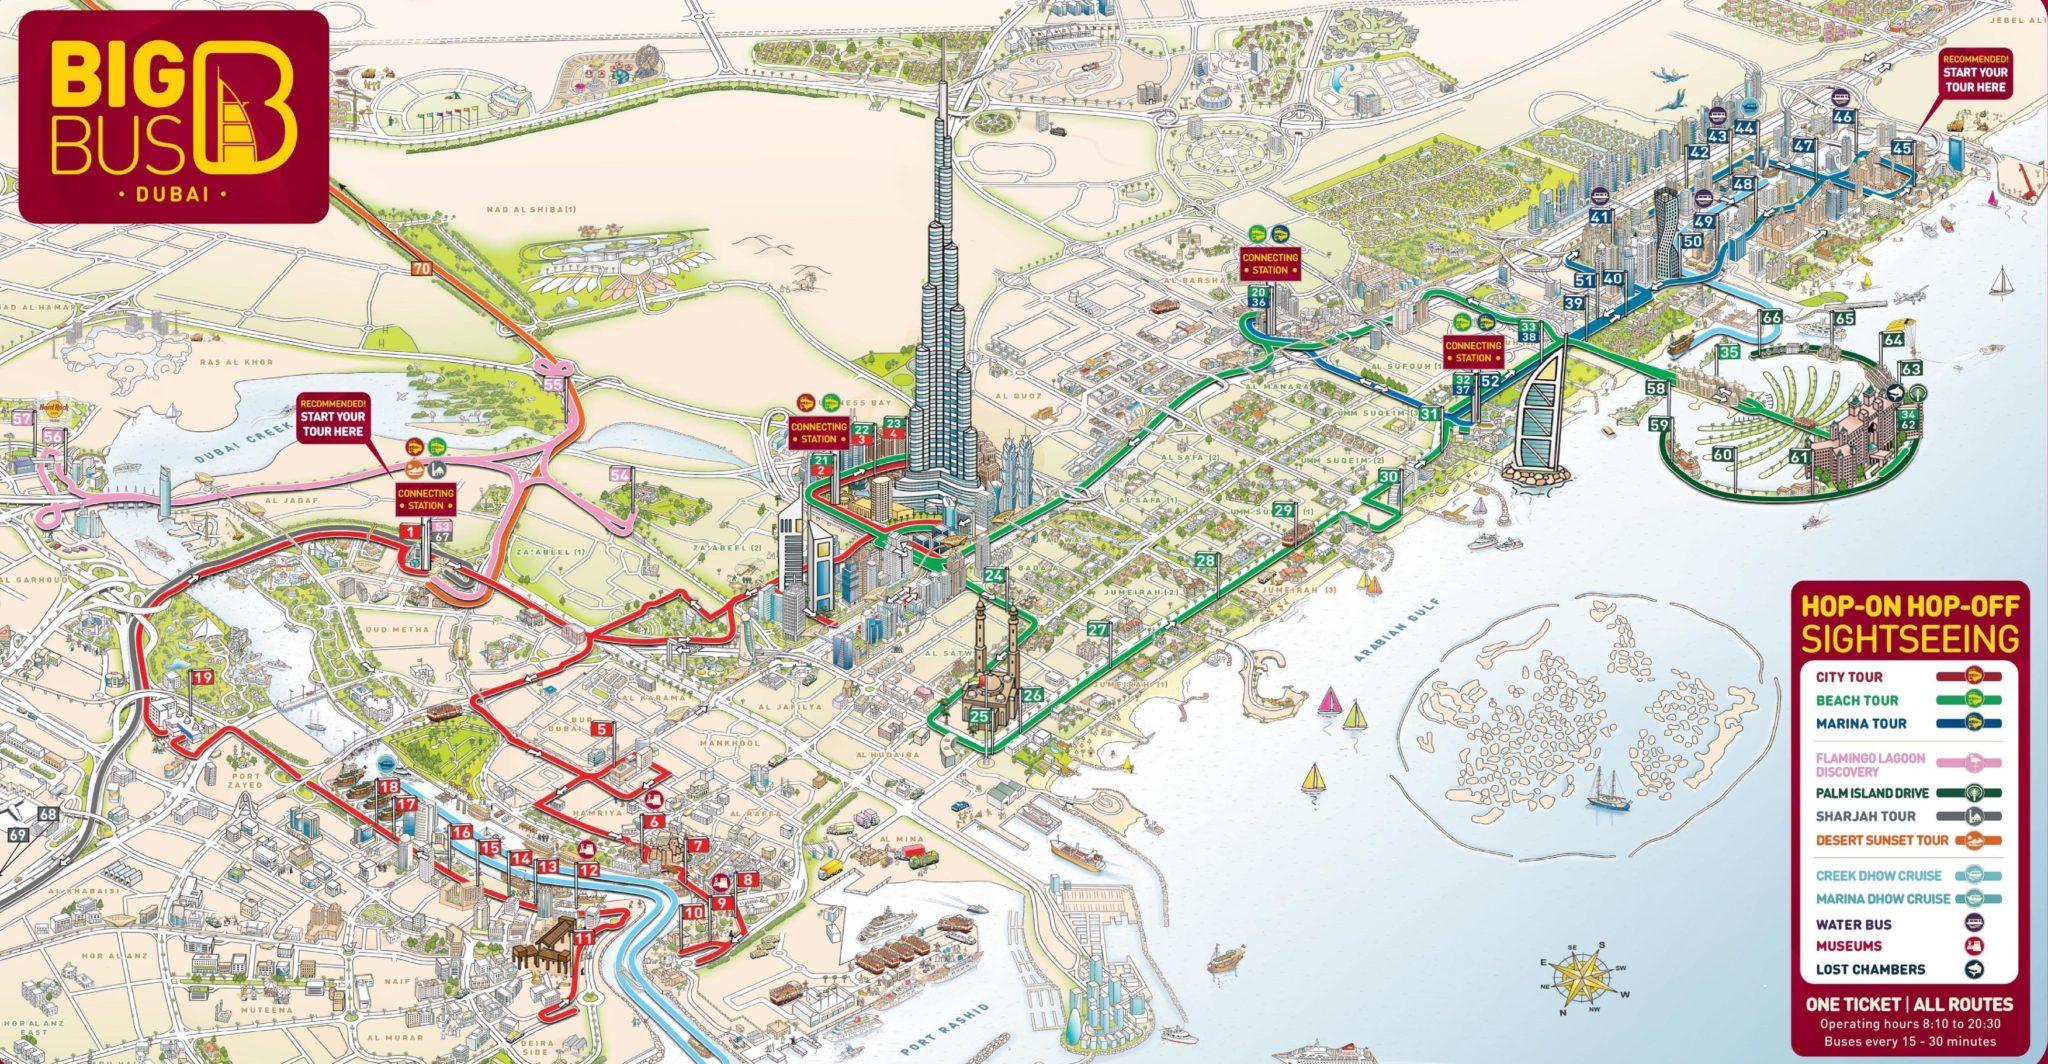 An Interactive Dubai Map by Google